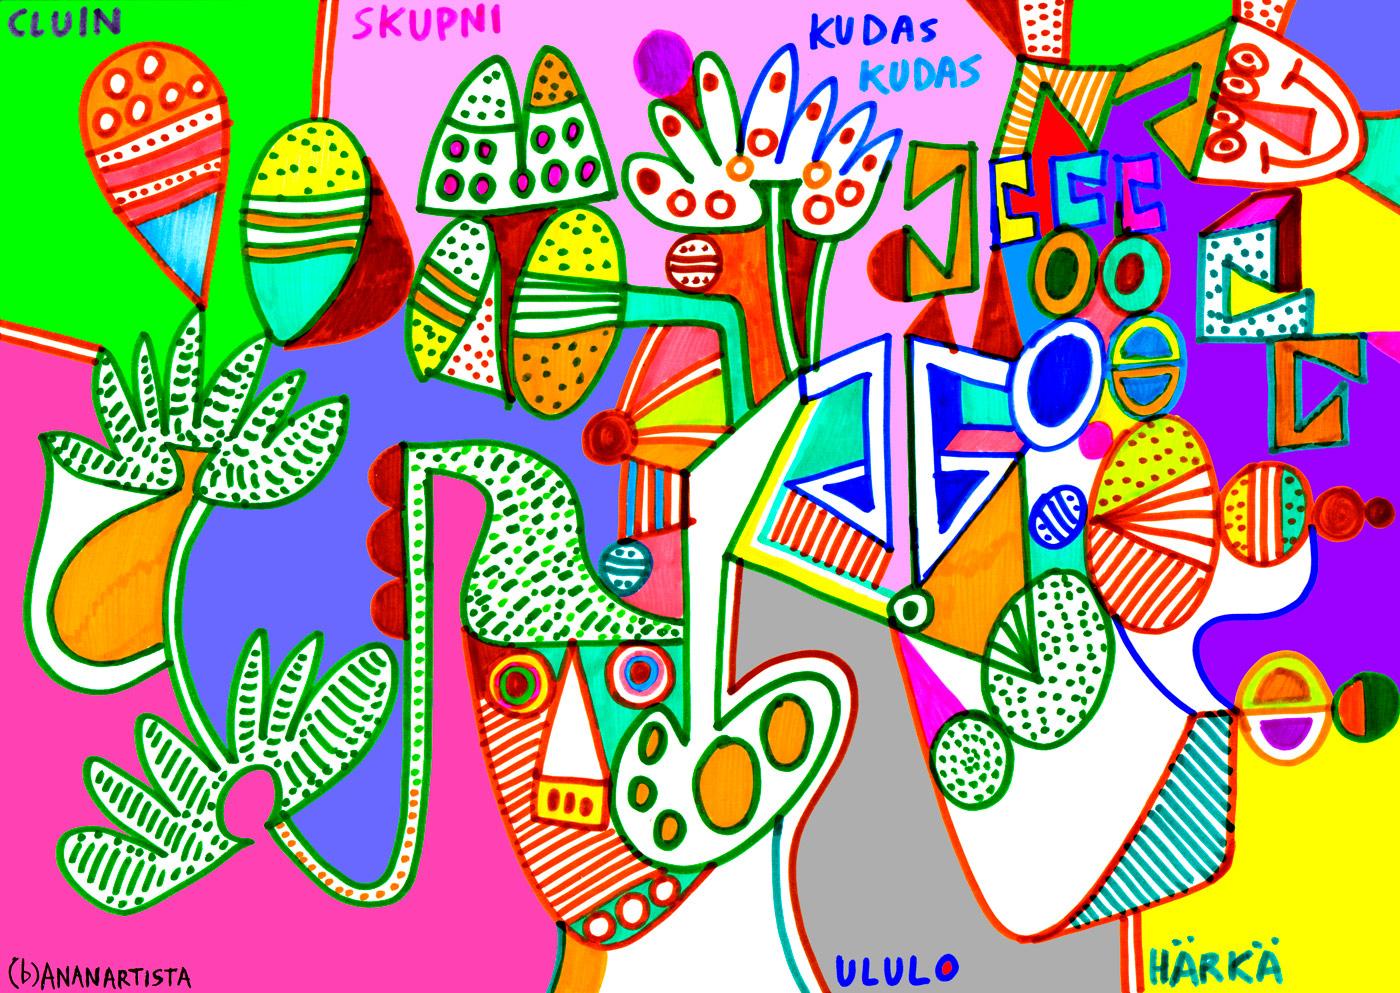 Cluin skupni kudas ululo harka (original artwork) by (b)ananartista sbuff